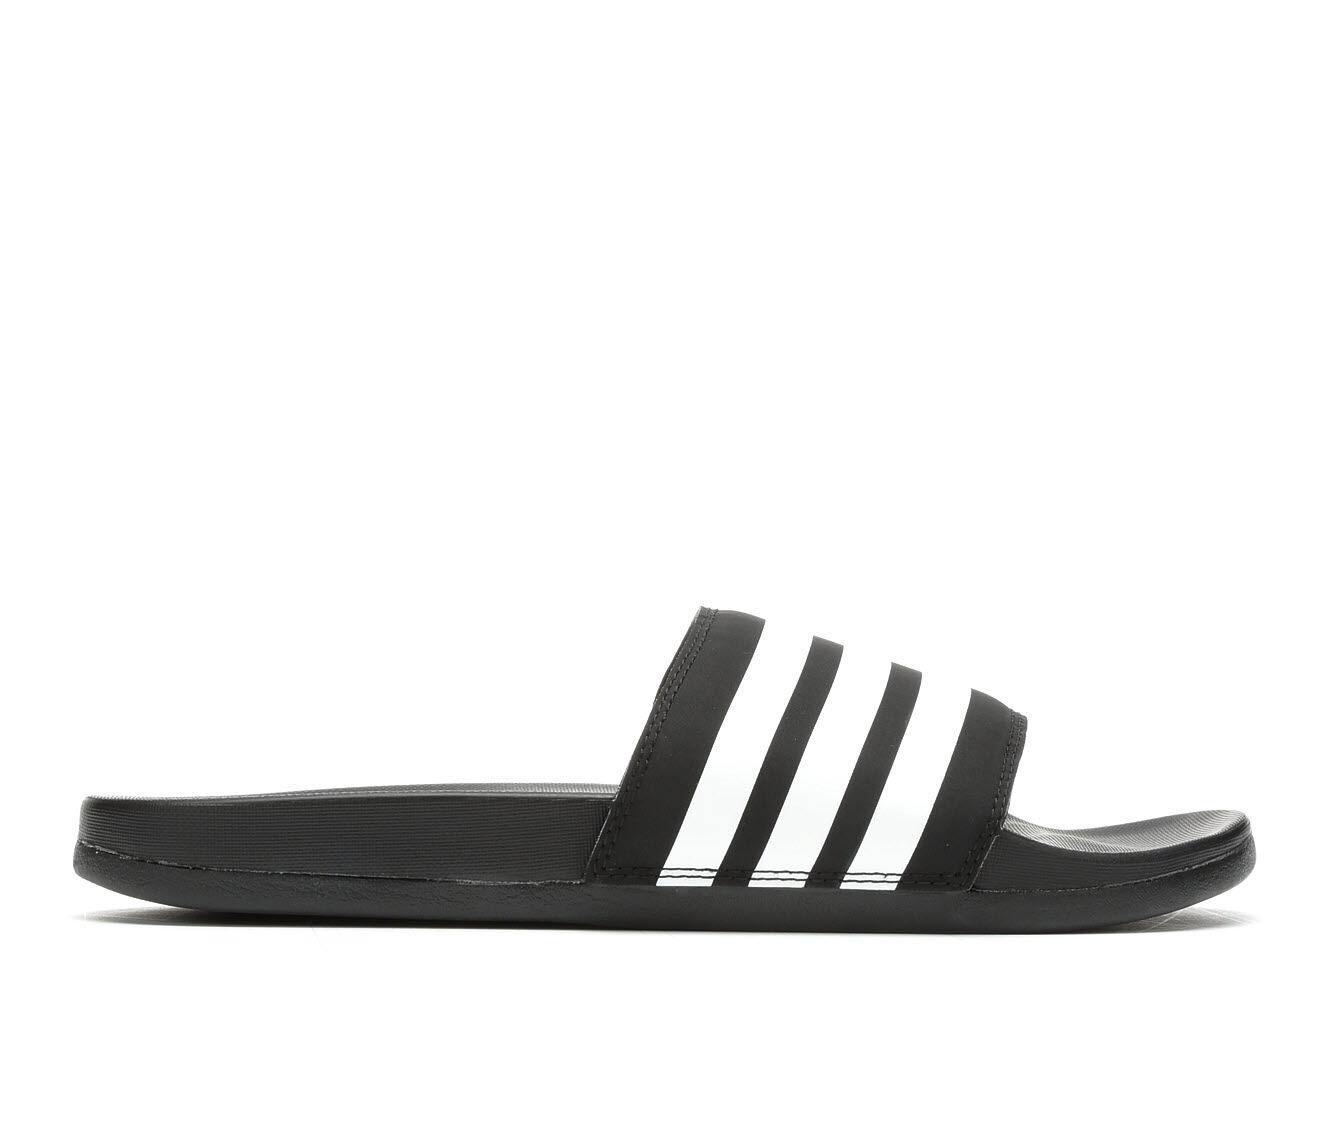 Women's Adidas Adilette CF Stripes Sport Slides Black/White